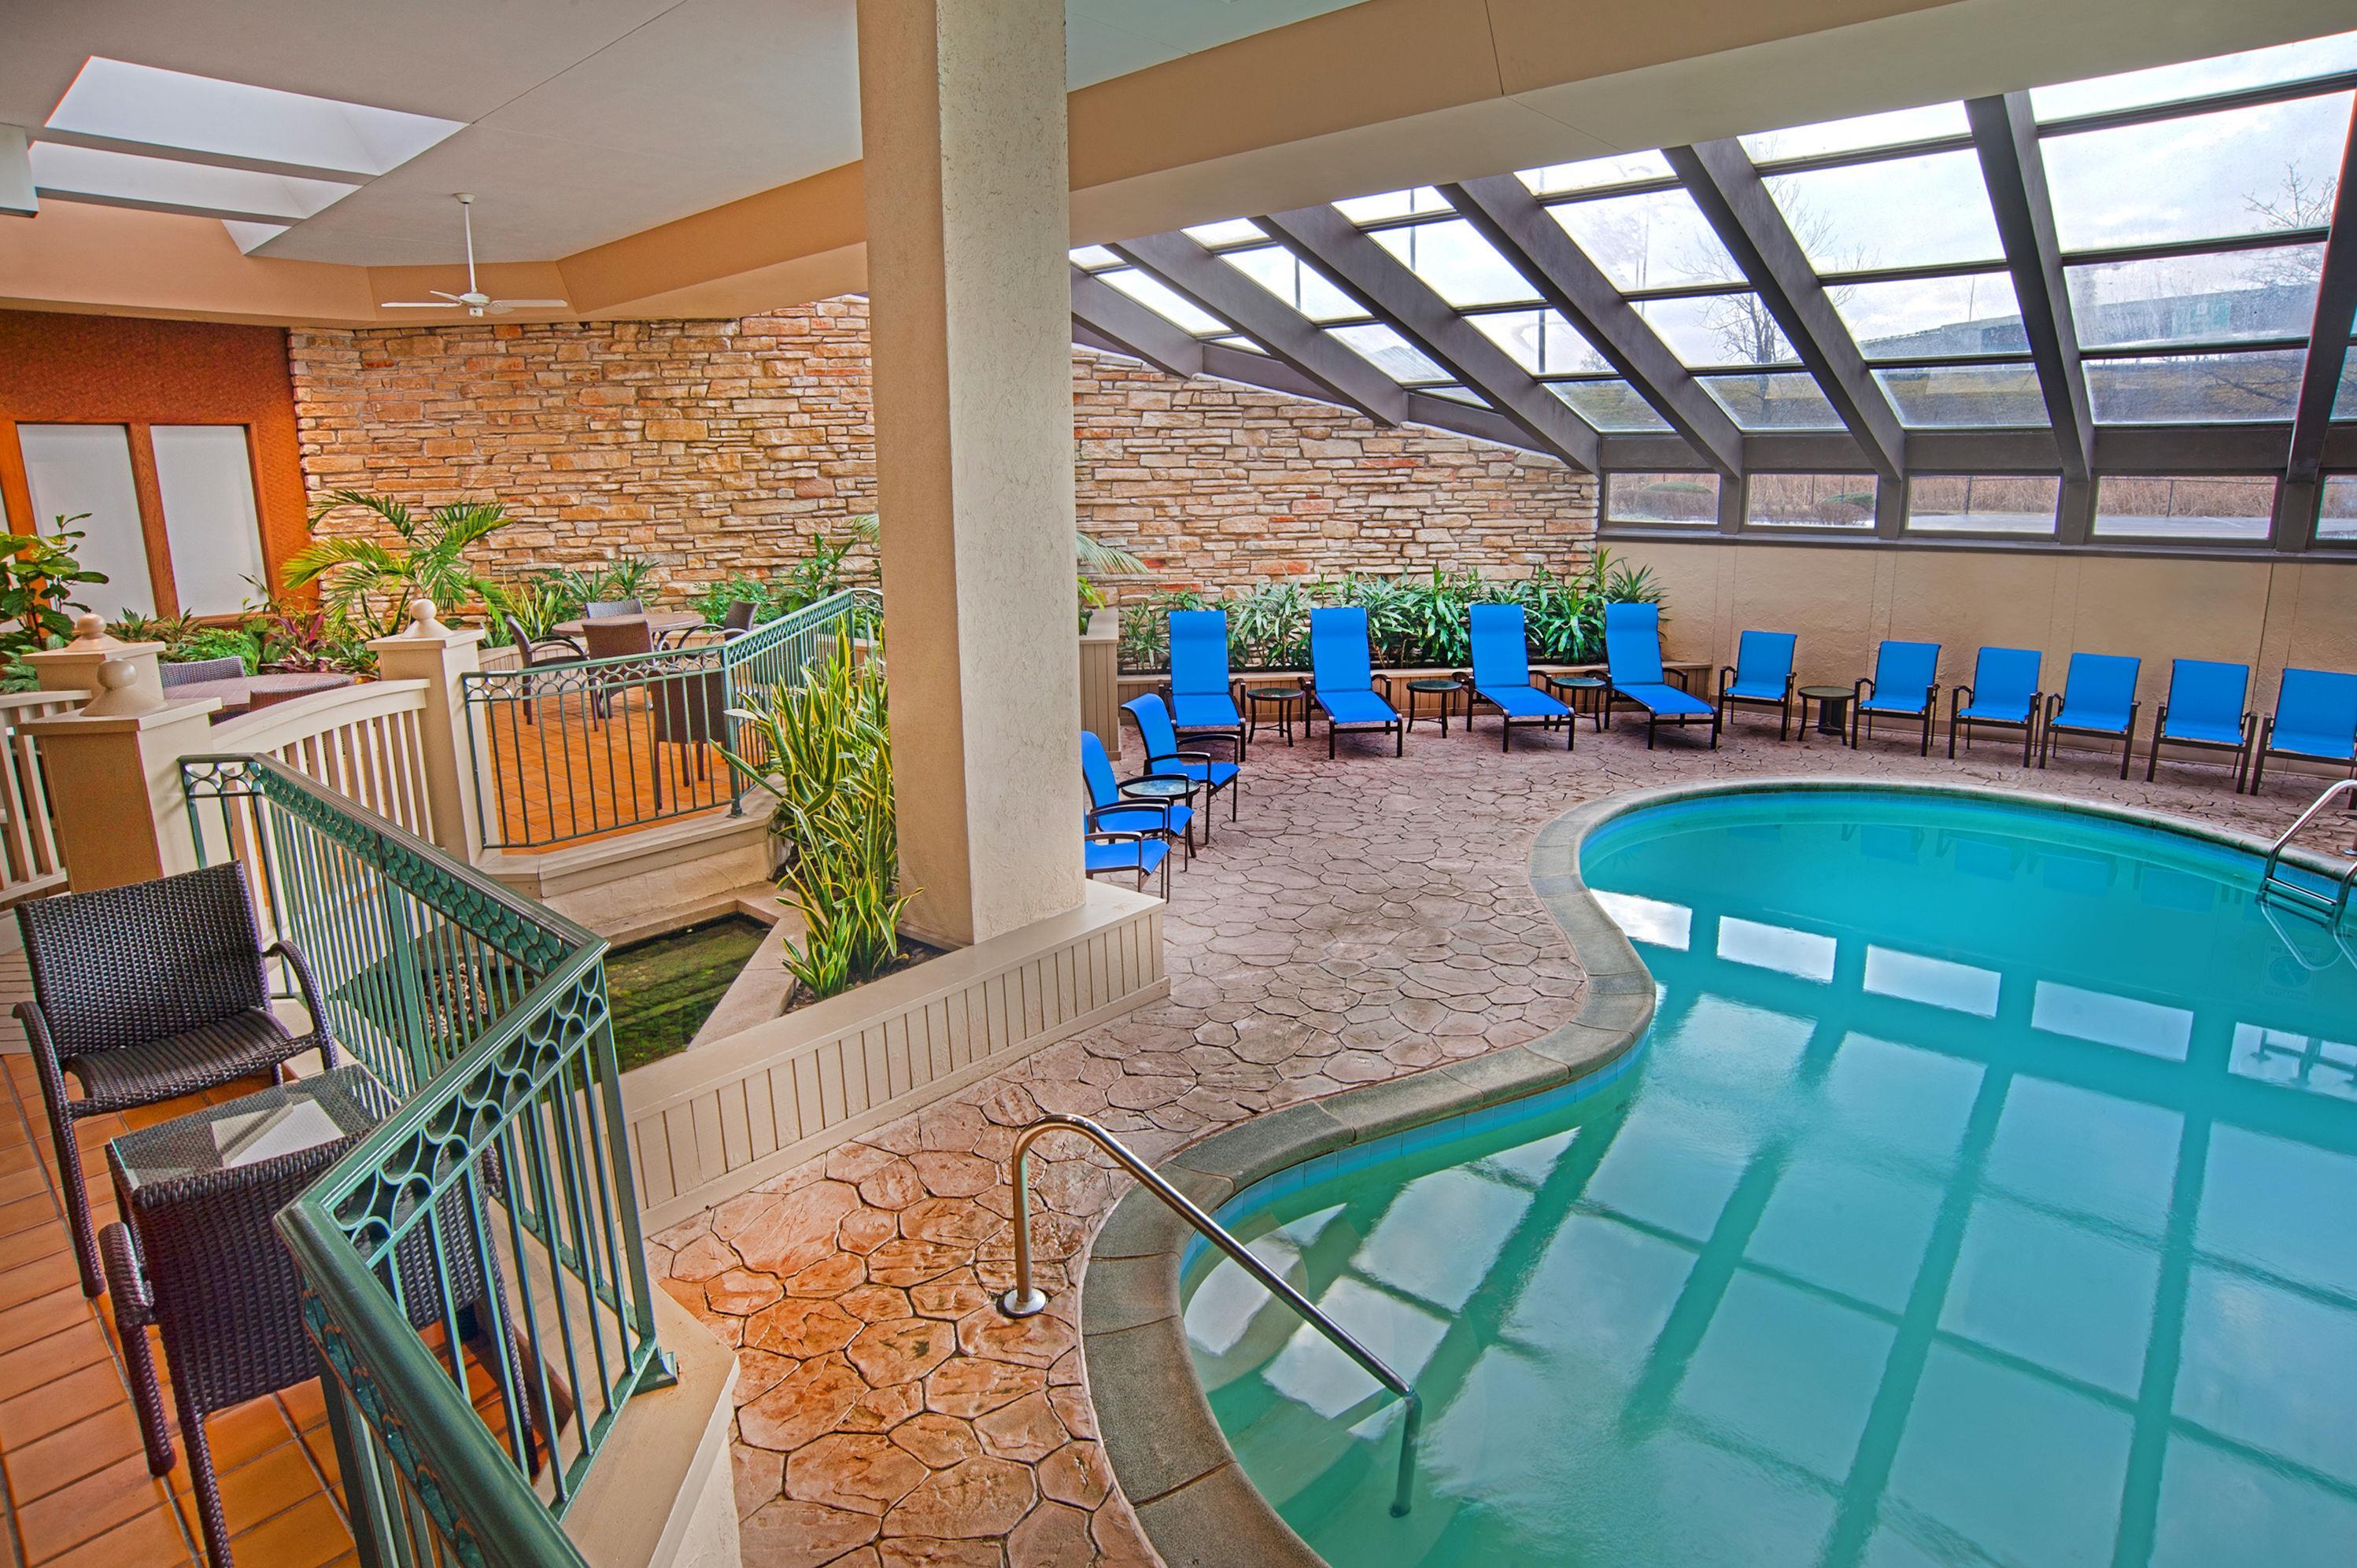 Sheraton Westport Plaza Hotel St. Louis image 3